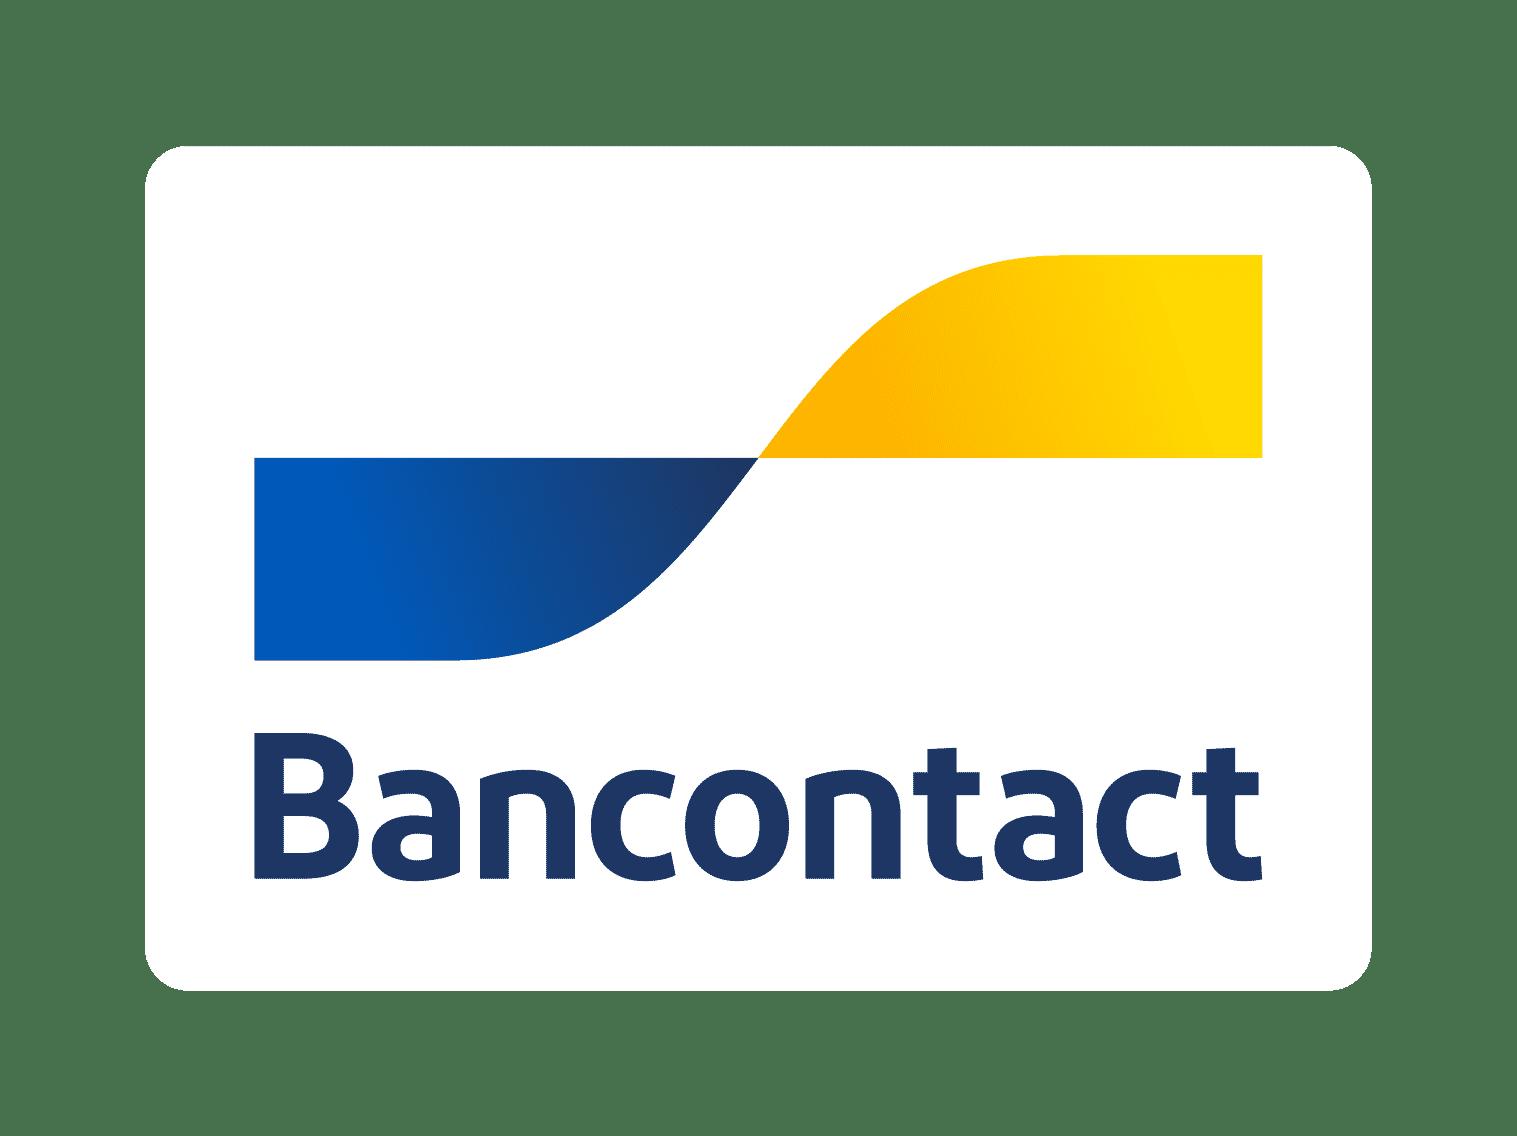 Bancontact-Original-logo-RGB